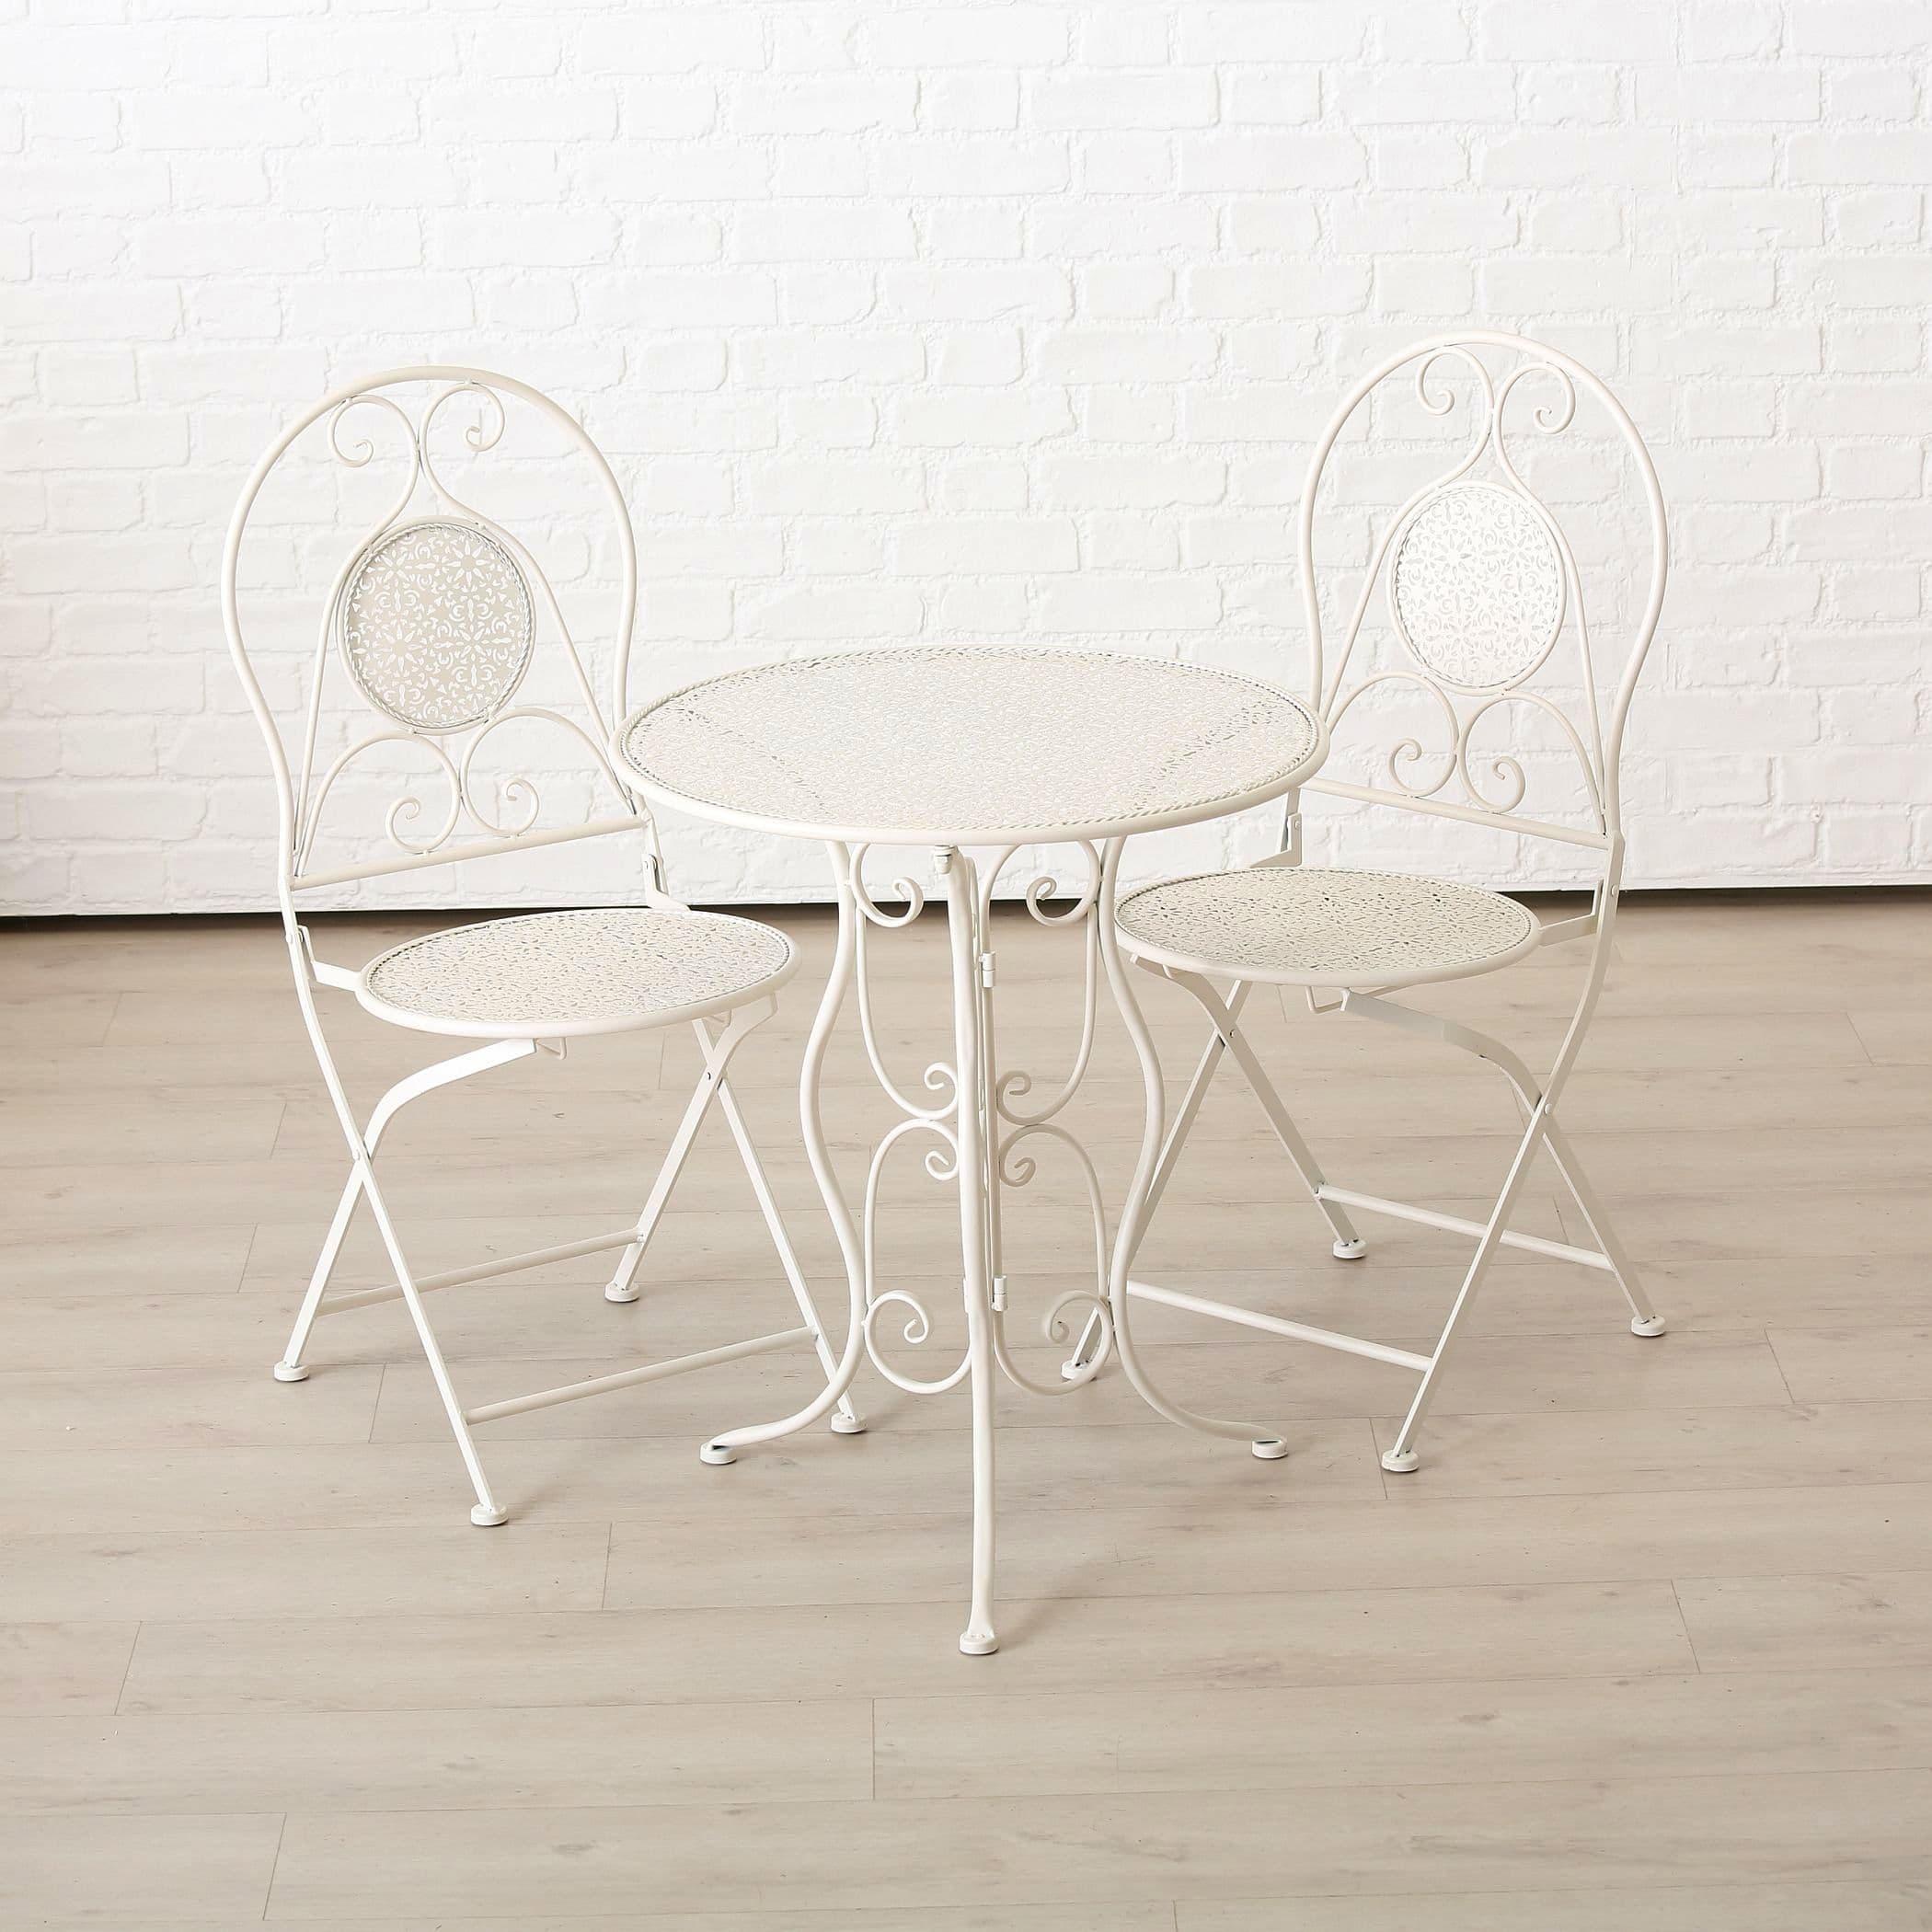 Set masa de gradina / terasa din metal + 2 scaune pliabile Lilli Alb, Ø60xH70 cm